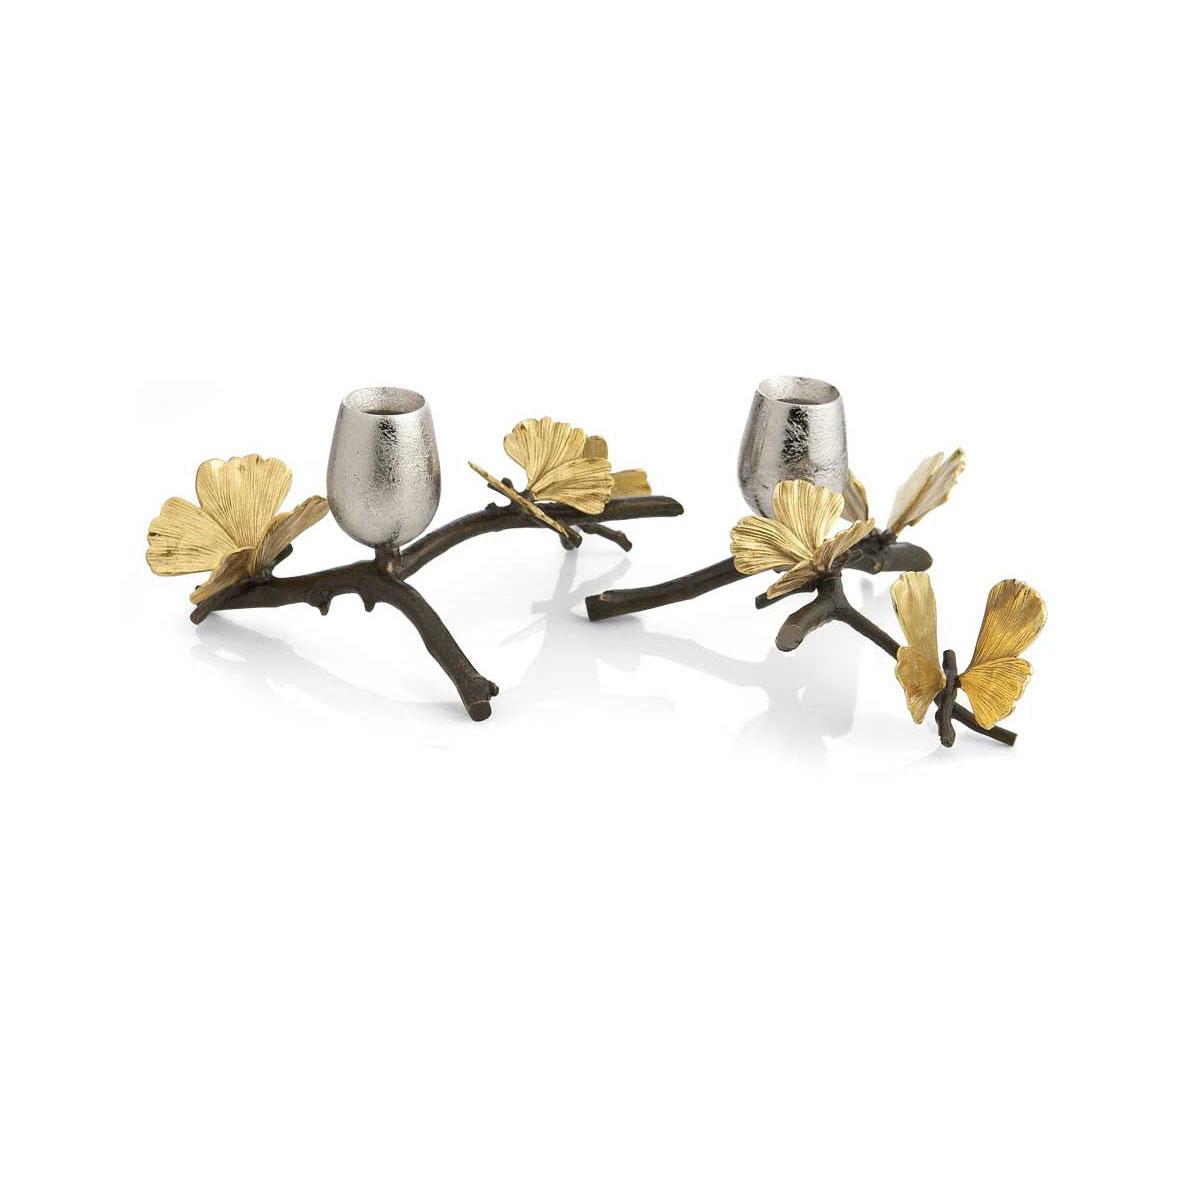 Michael Aram Butterfly Ginkgo Low Candleholder, Pair